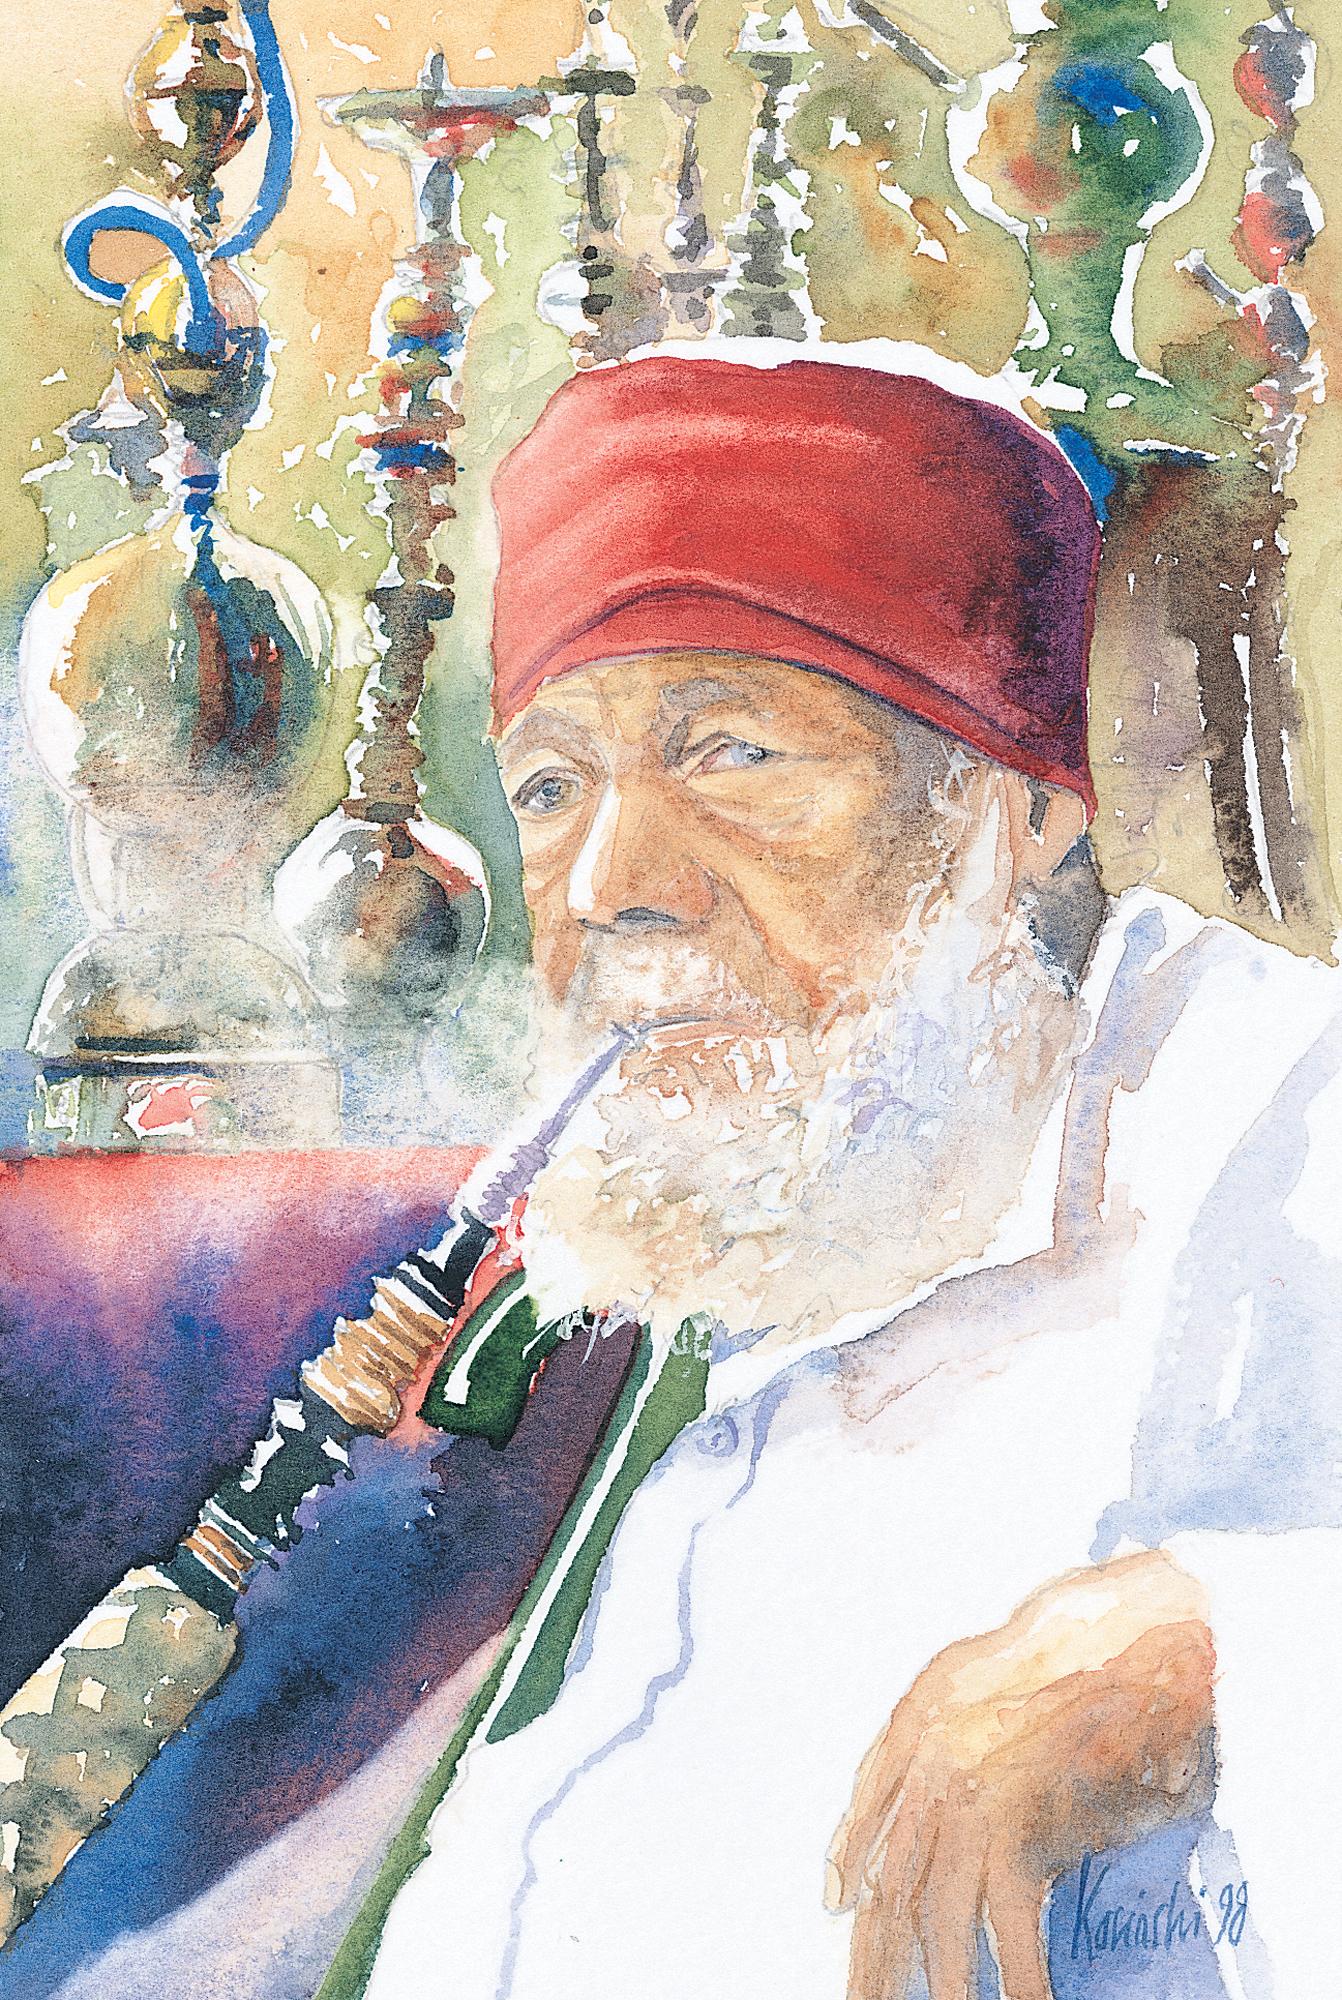 Old  Smoker, Khan Khalilee, Cairo